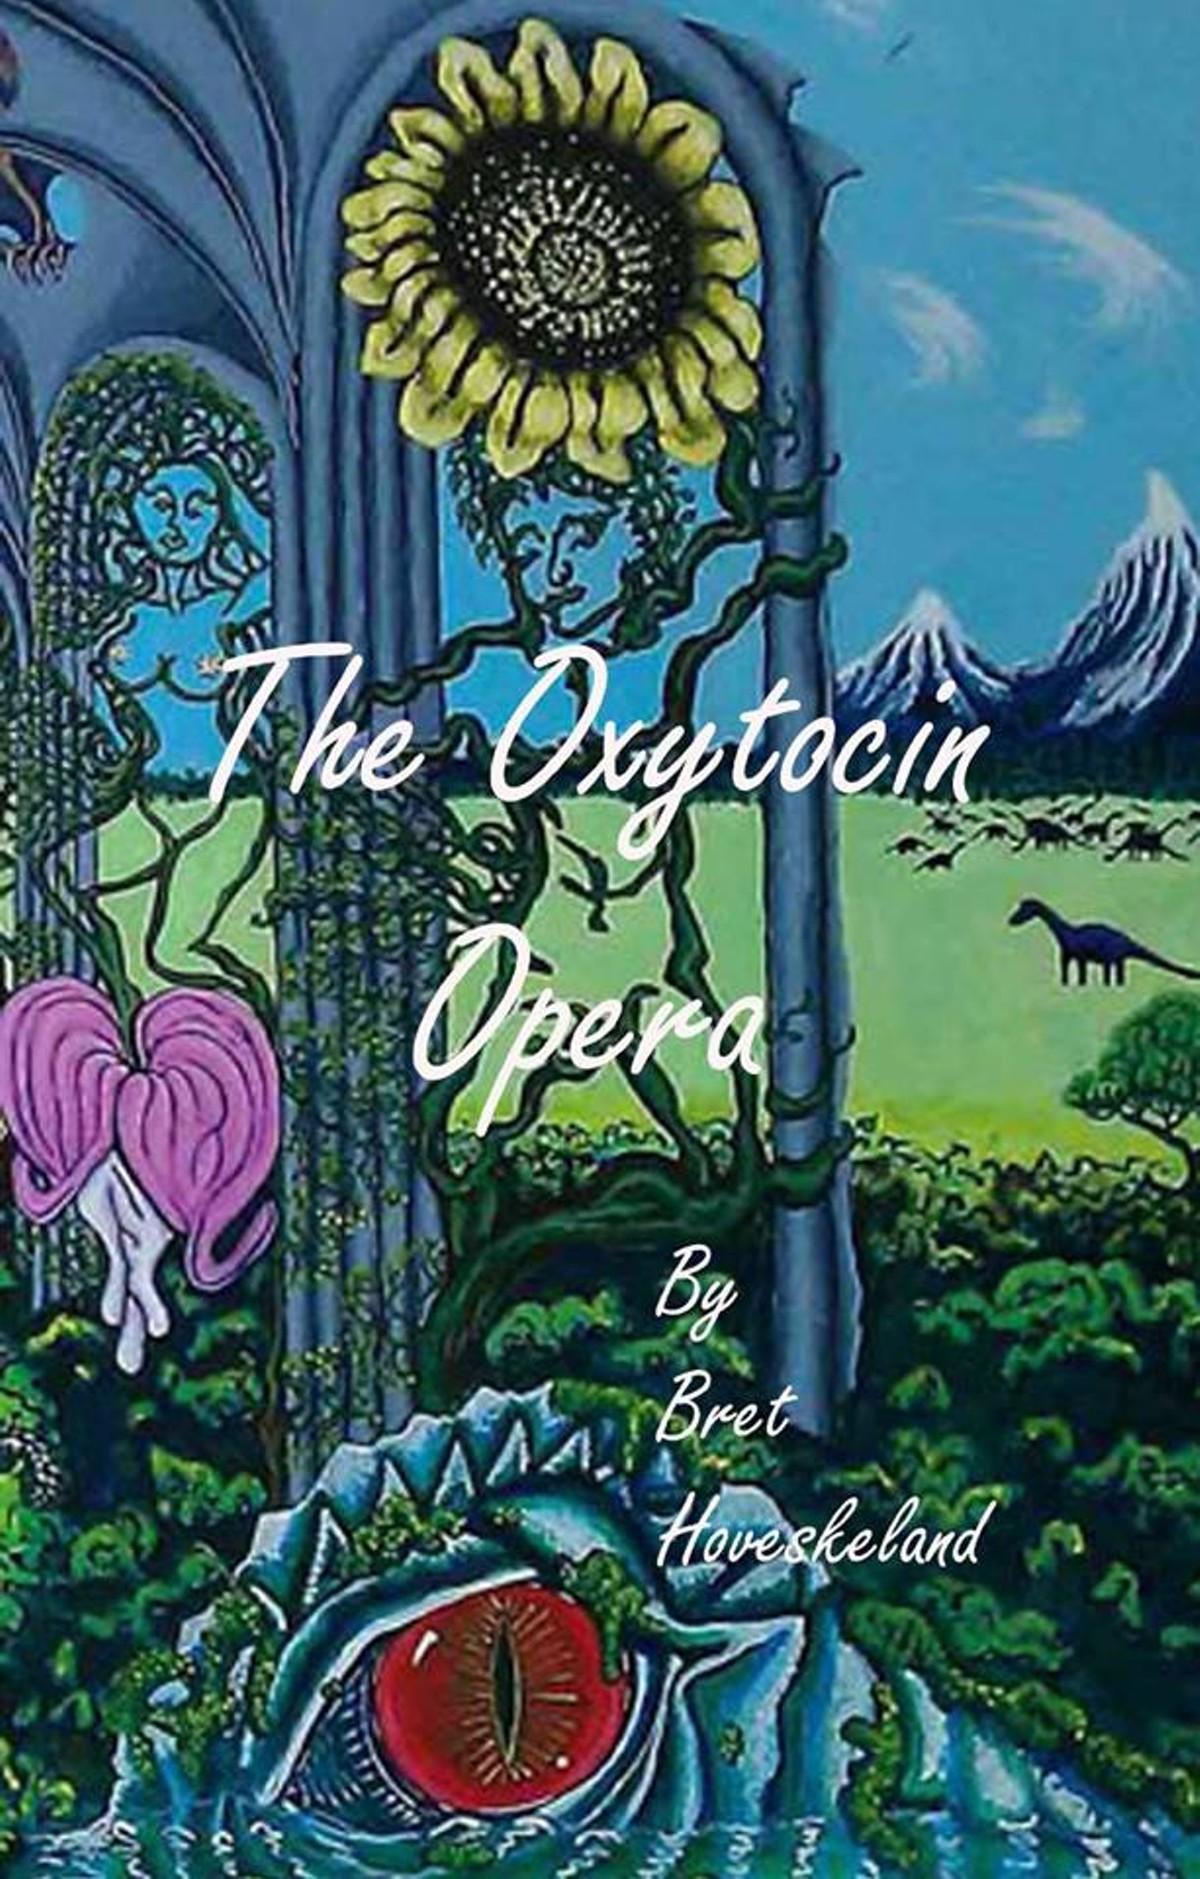 oxytocin_opera_cover_image.jpg